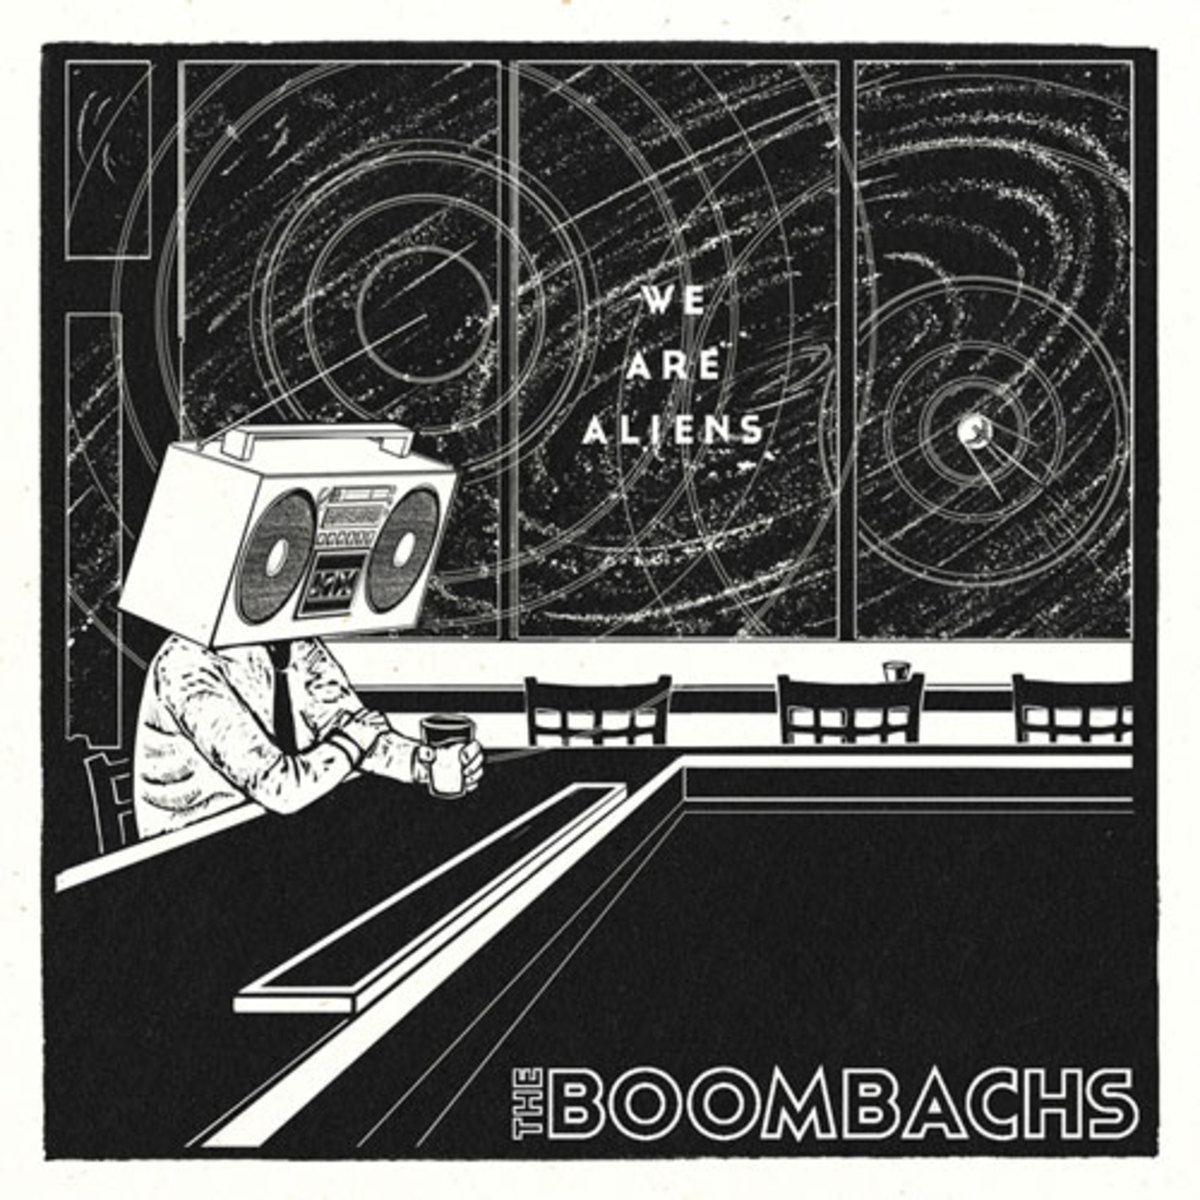 theboombachs-wearealiens.jpg